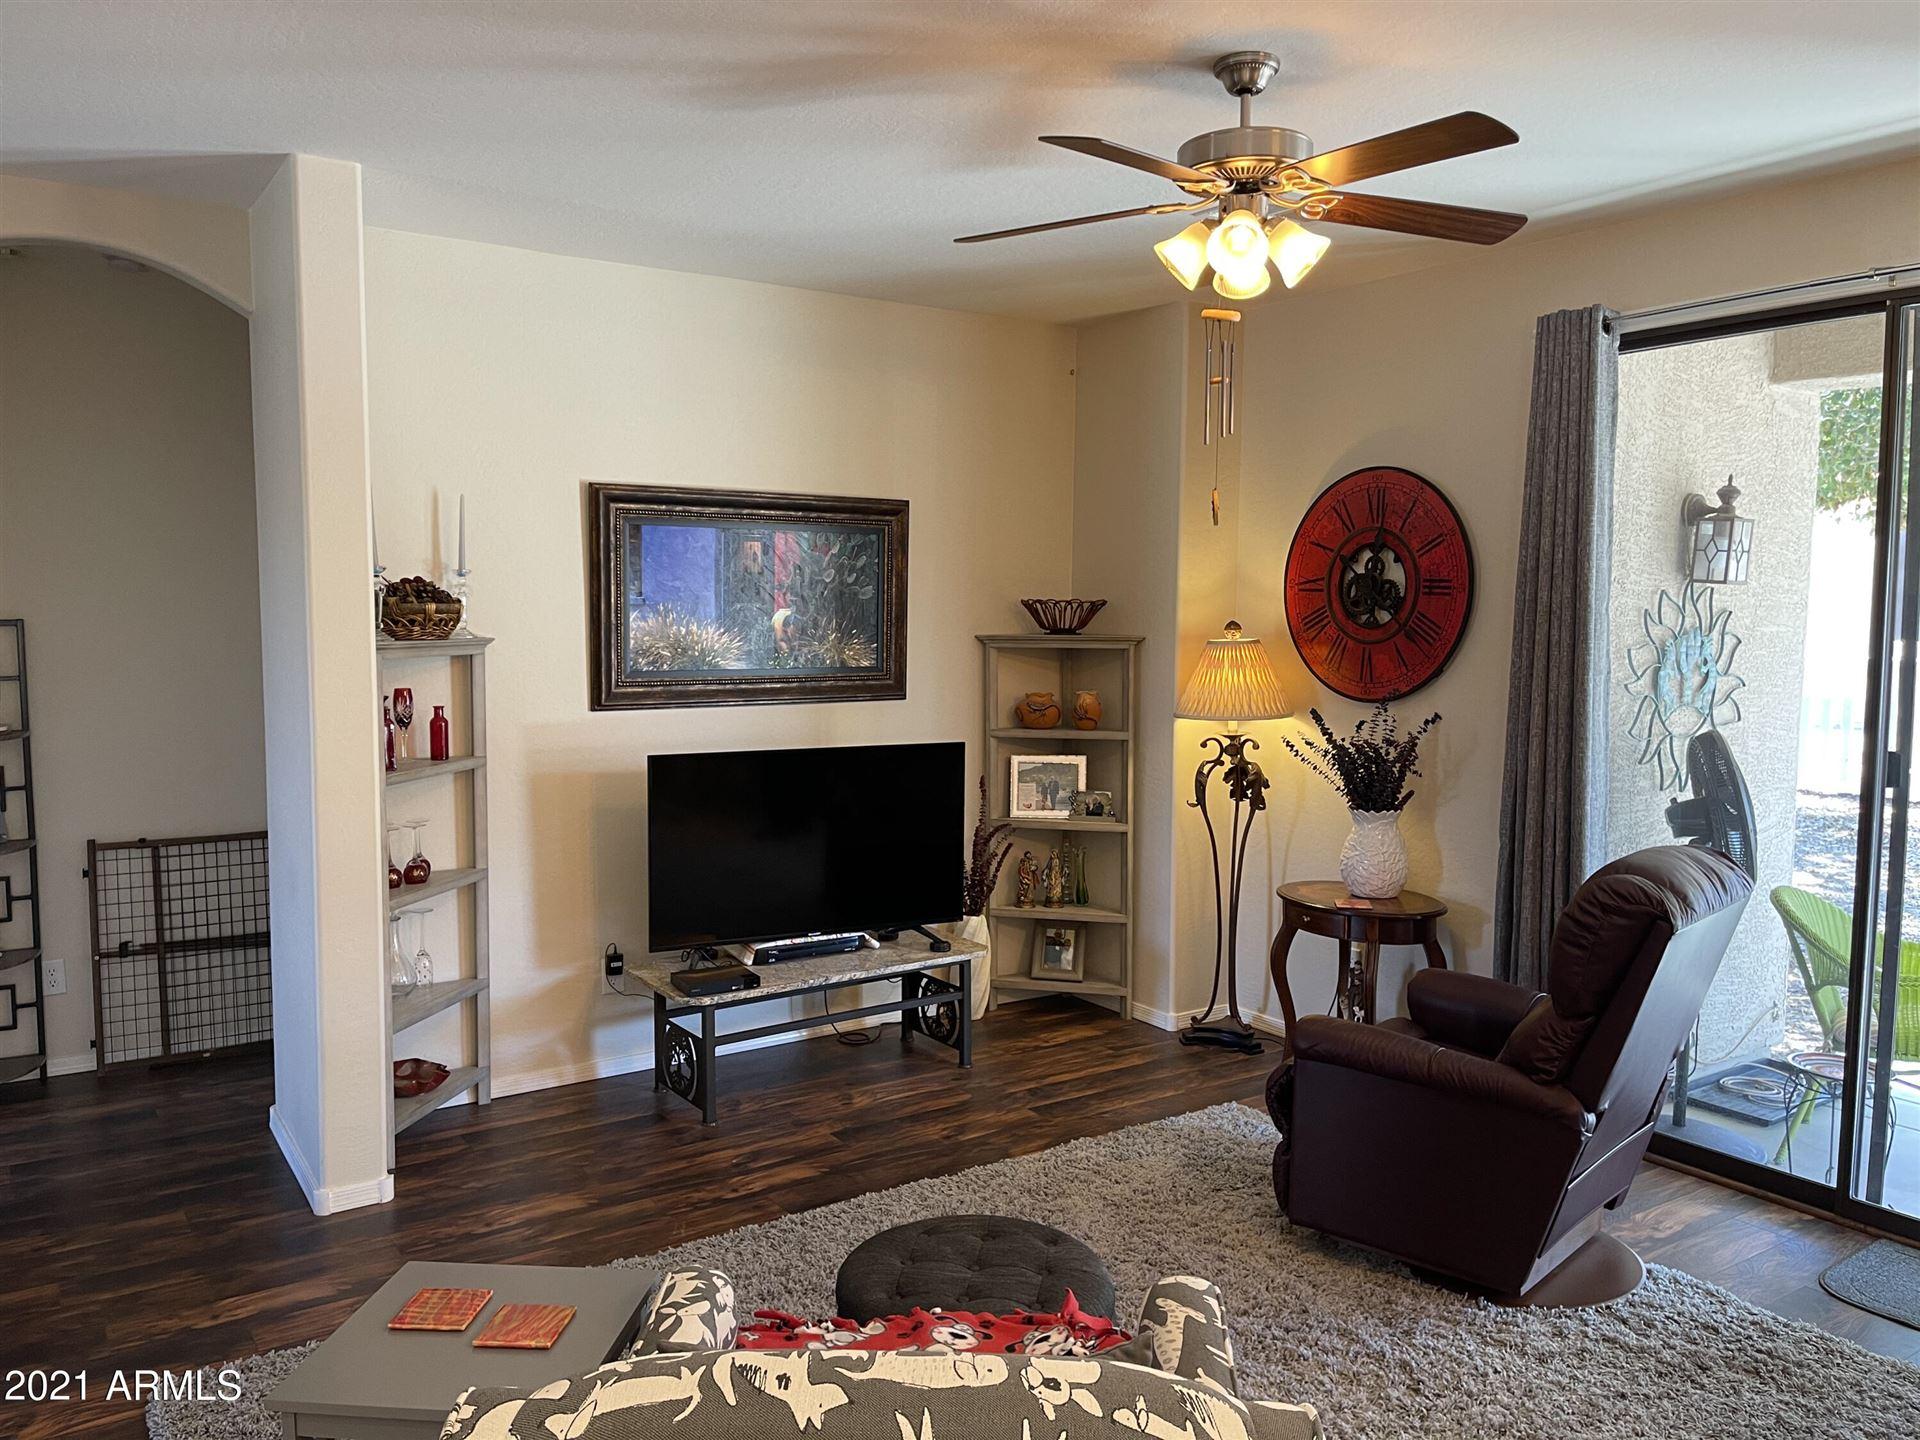 Photo of 2101 S MERIDIAN Road #204, Apache Junction, AZ 85120 (MLS # 6201788)